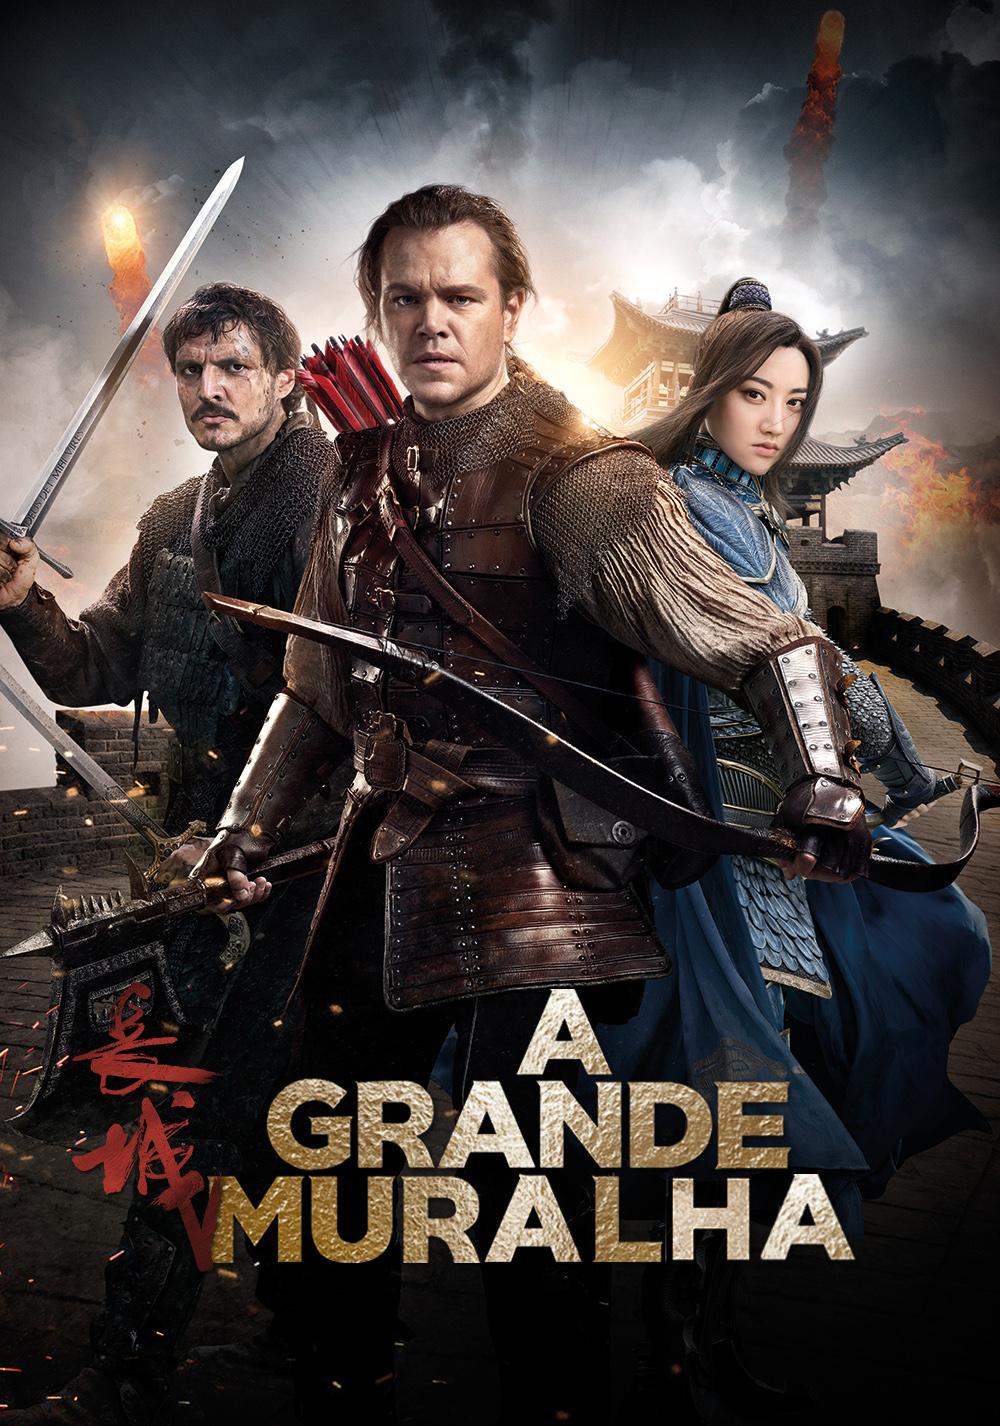 Film Great Wall